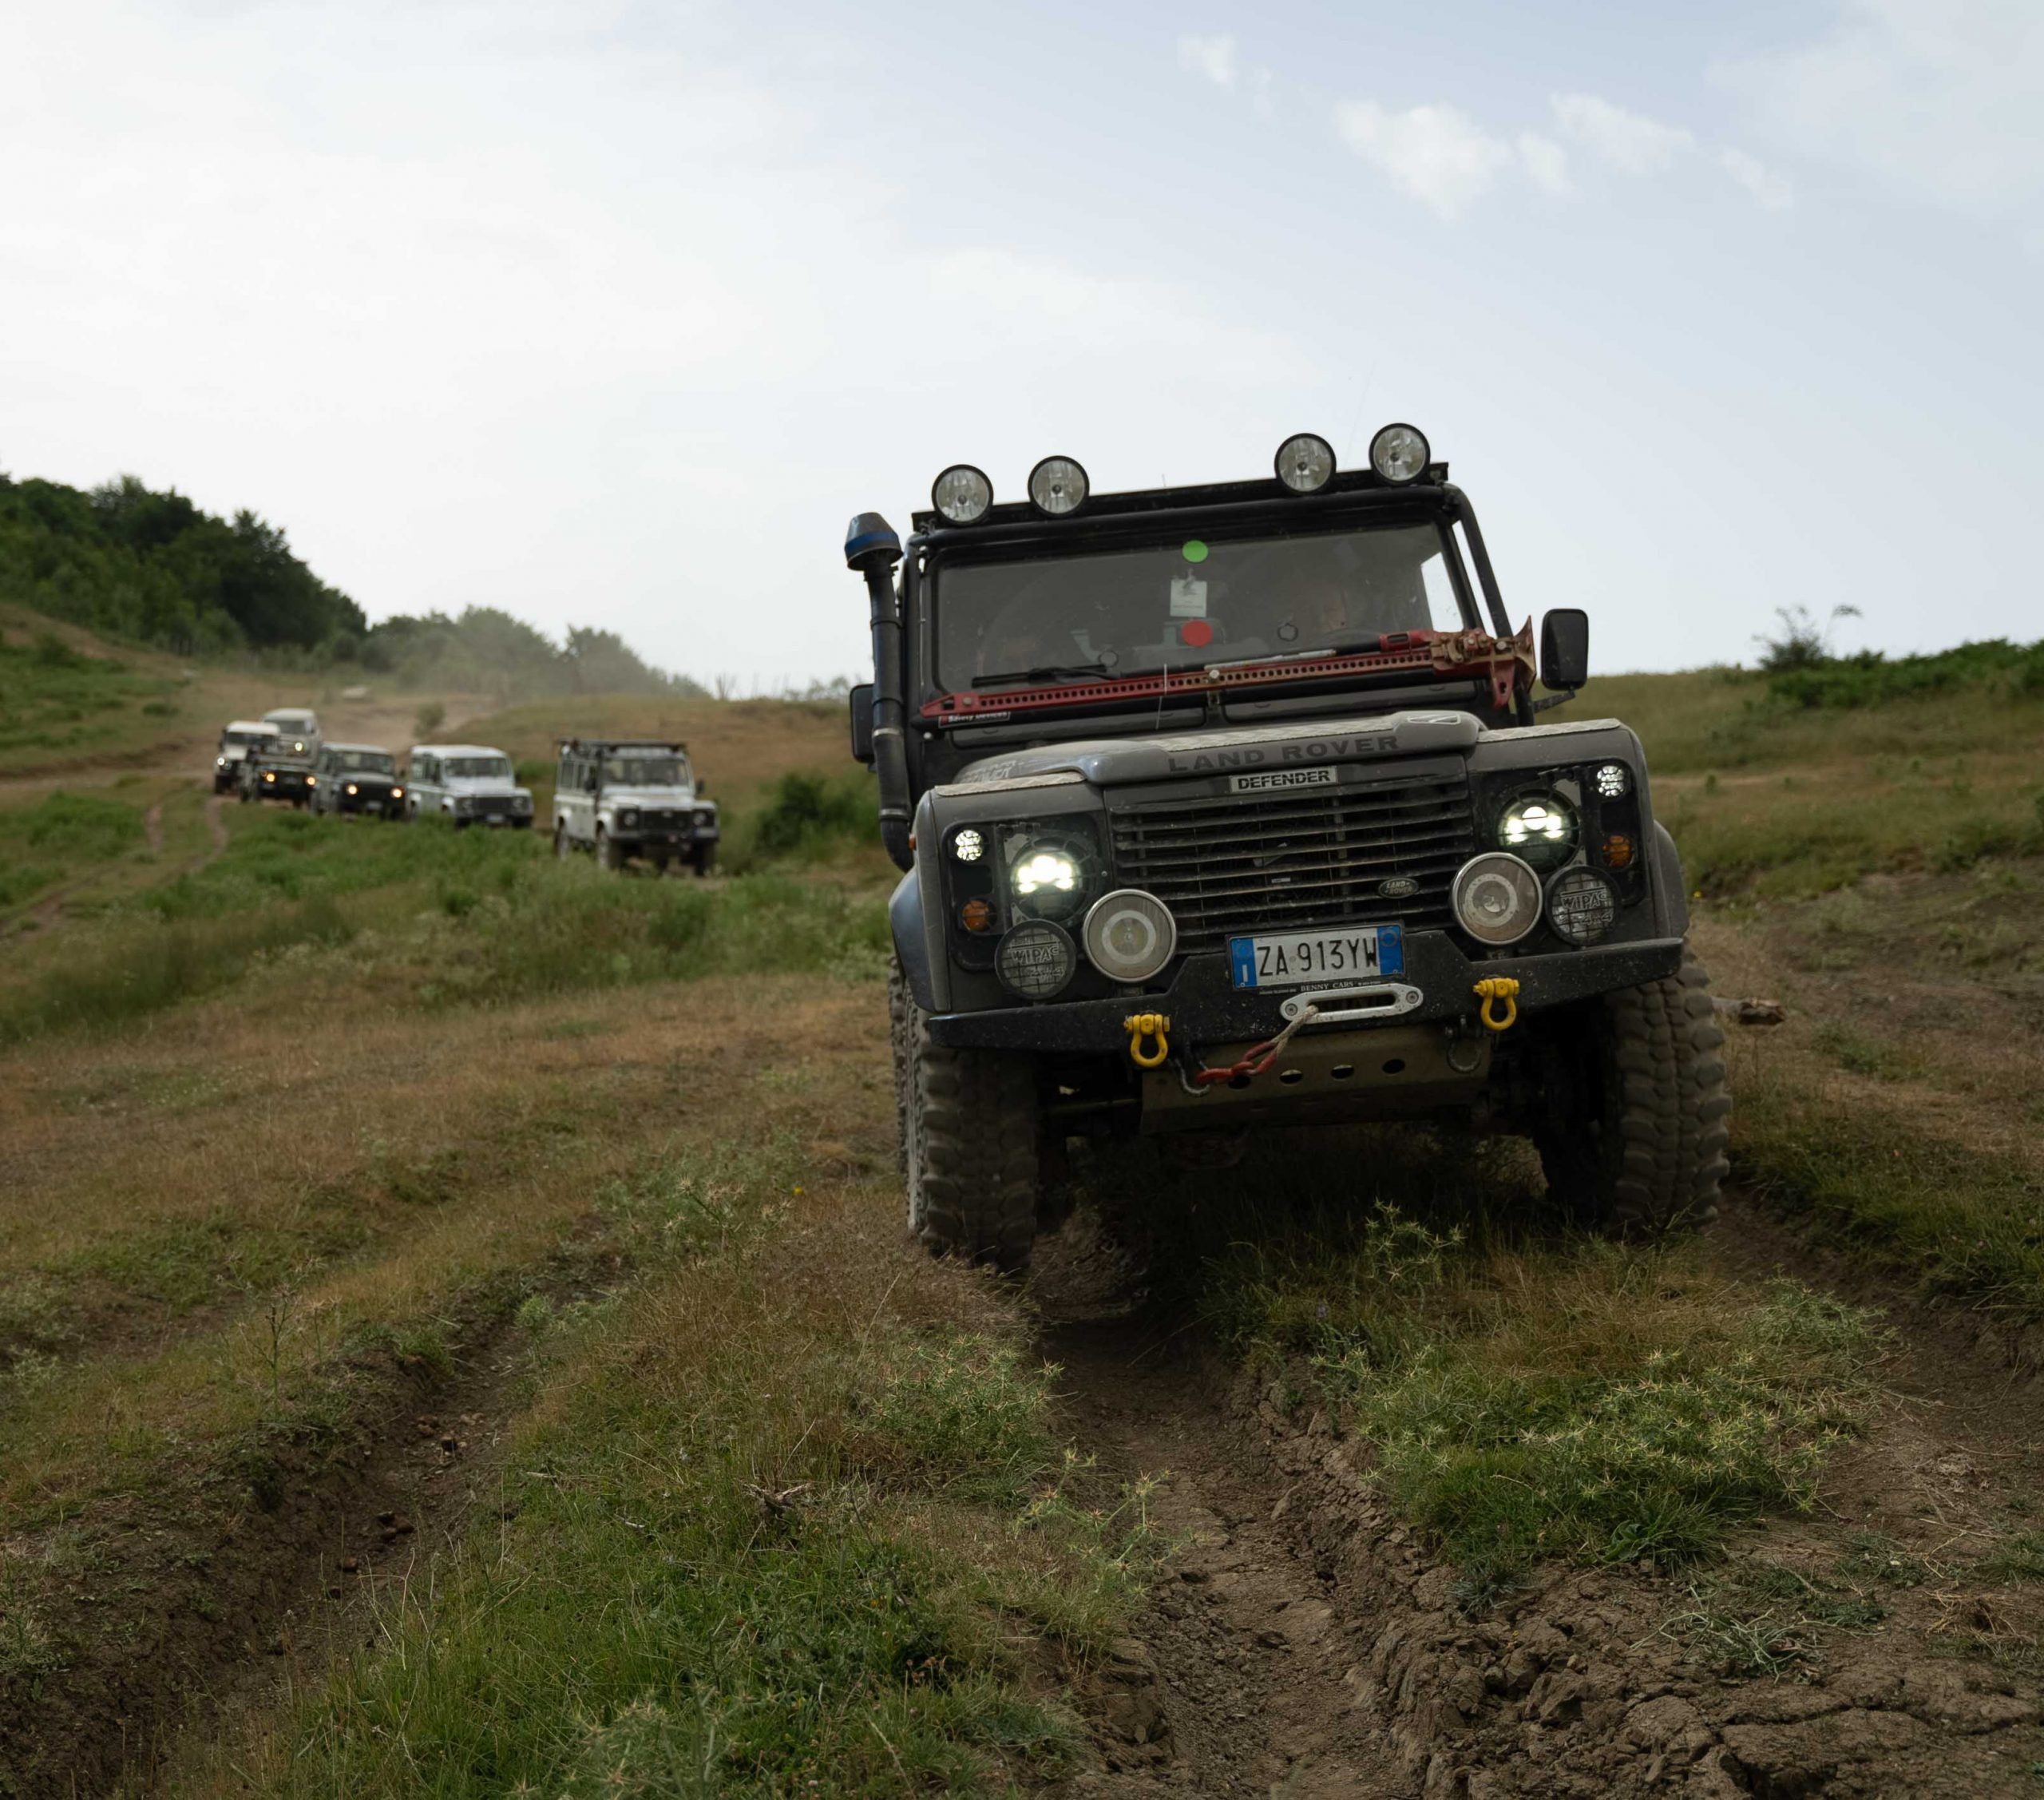 Land_Rover_Tour_Sicilia_2021_Land_Rover_Experience_Italia_-73